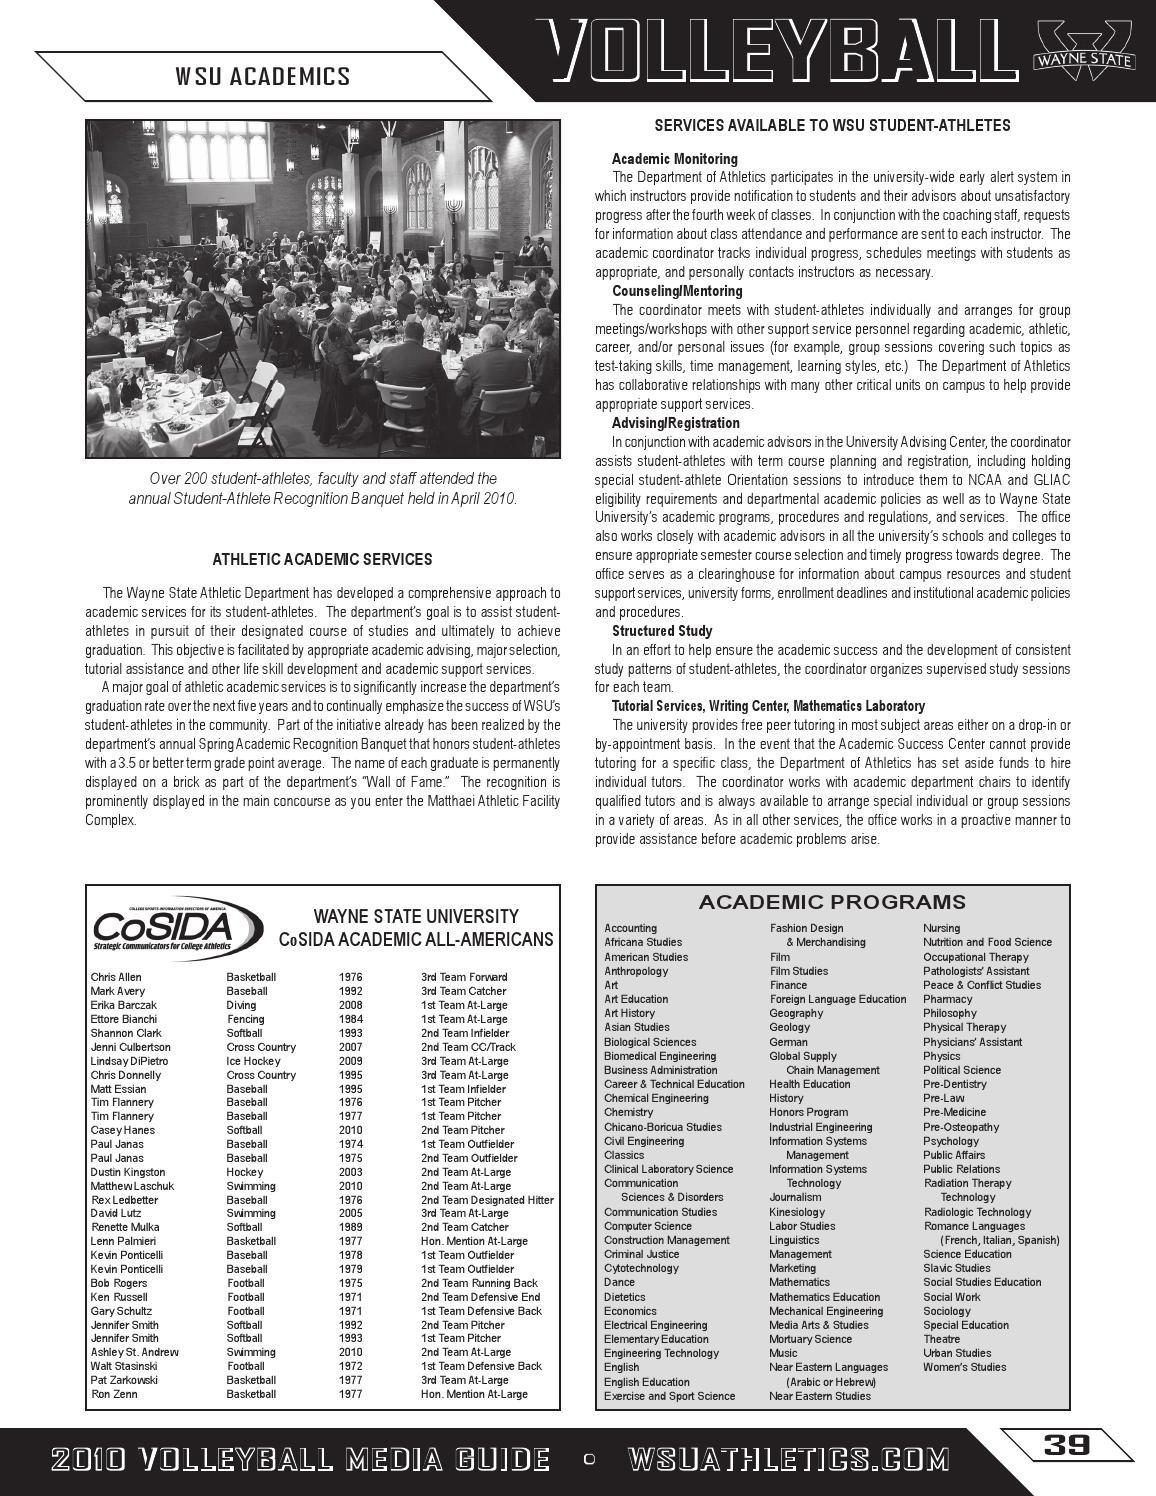 2010 Wayne State University Volleyball Media Guide By Wayne State University Warriors Issuu